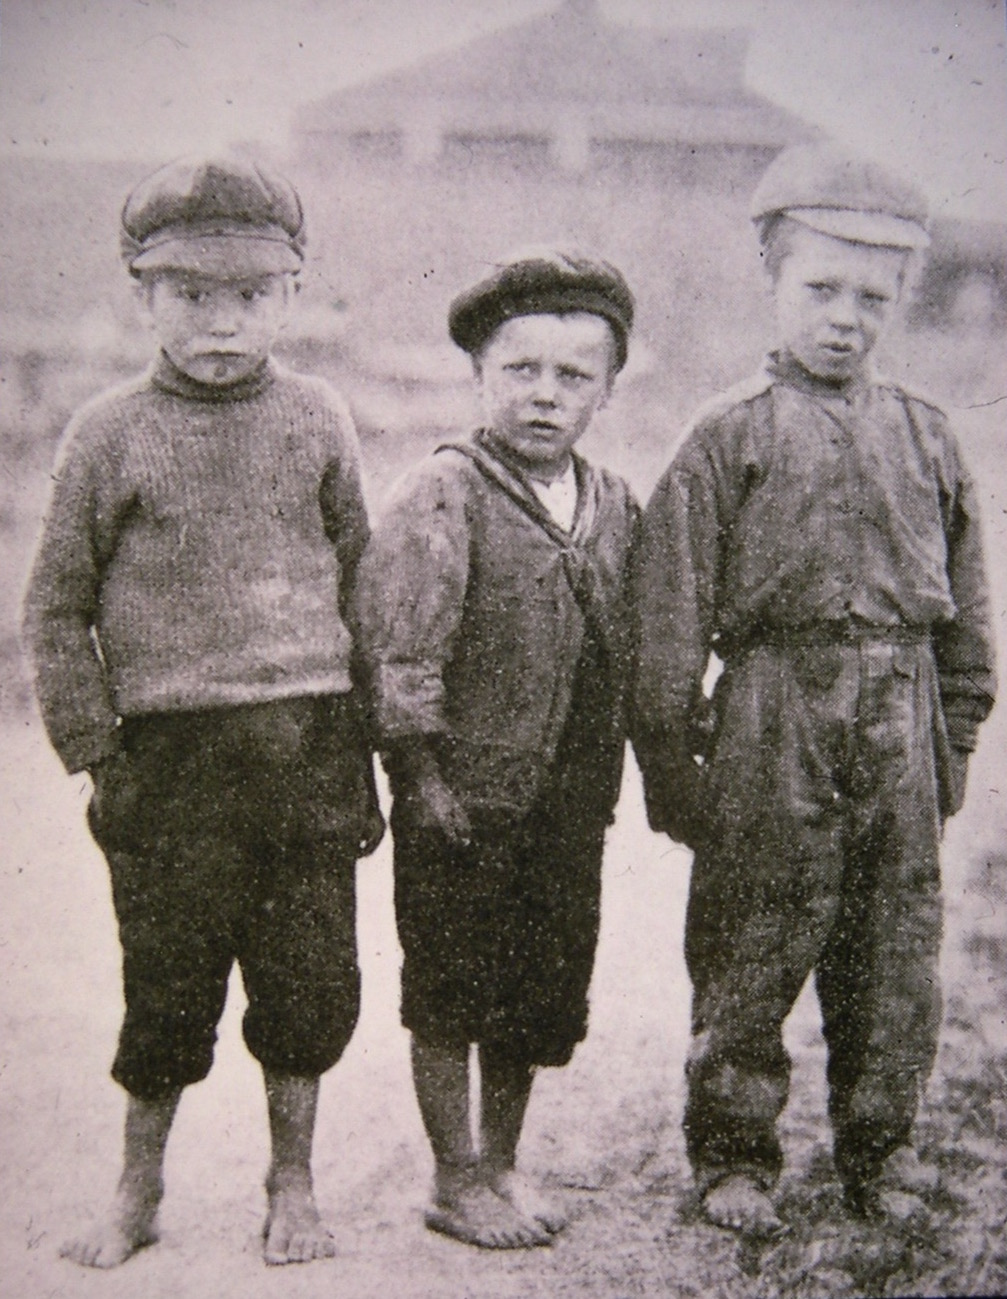 5. Tre små pojkar kopia